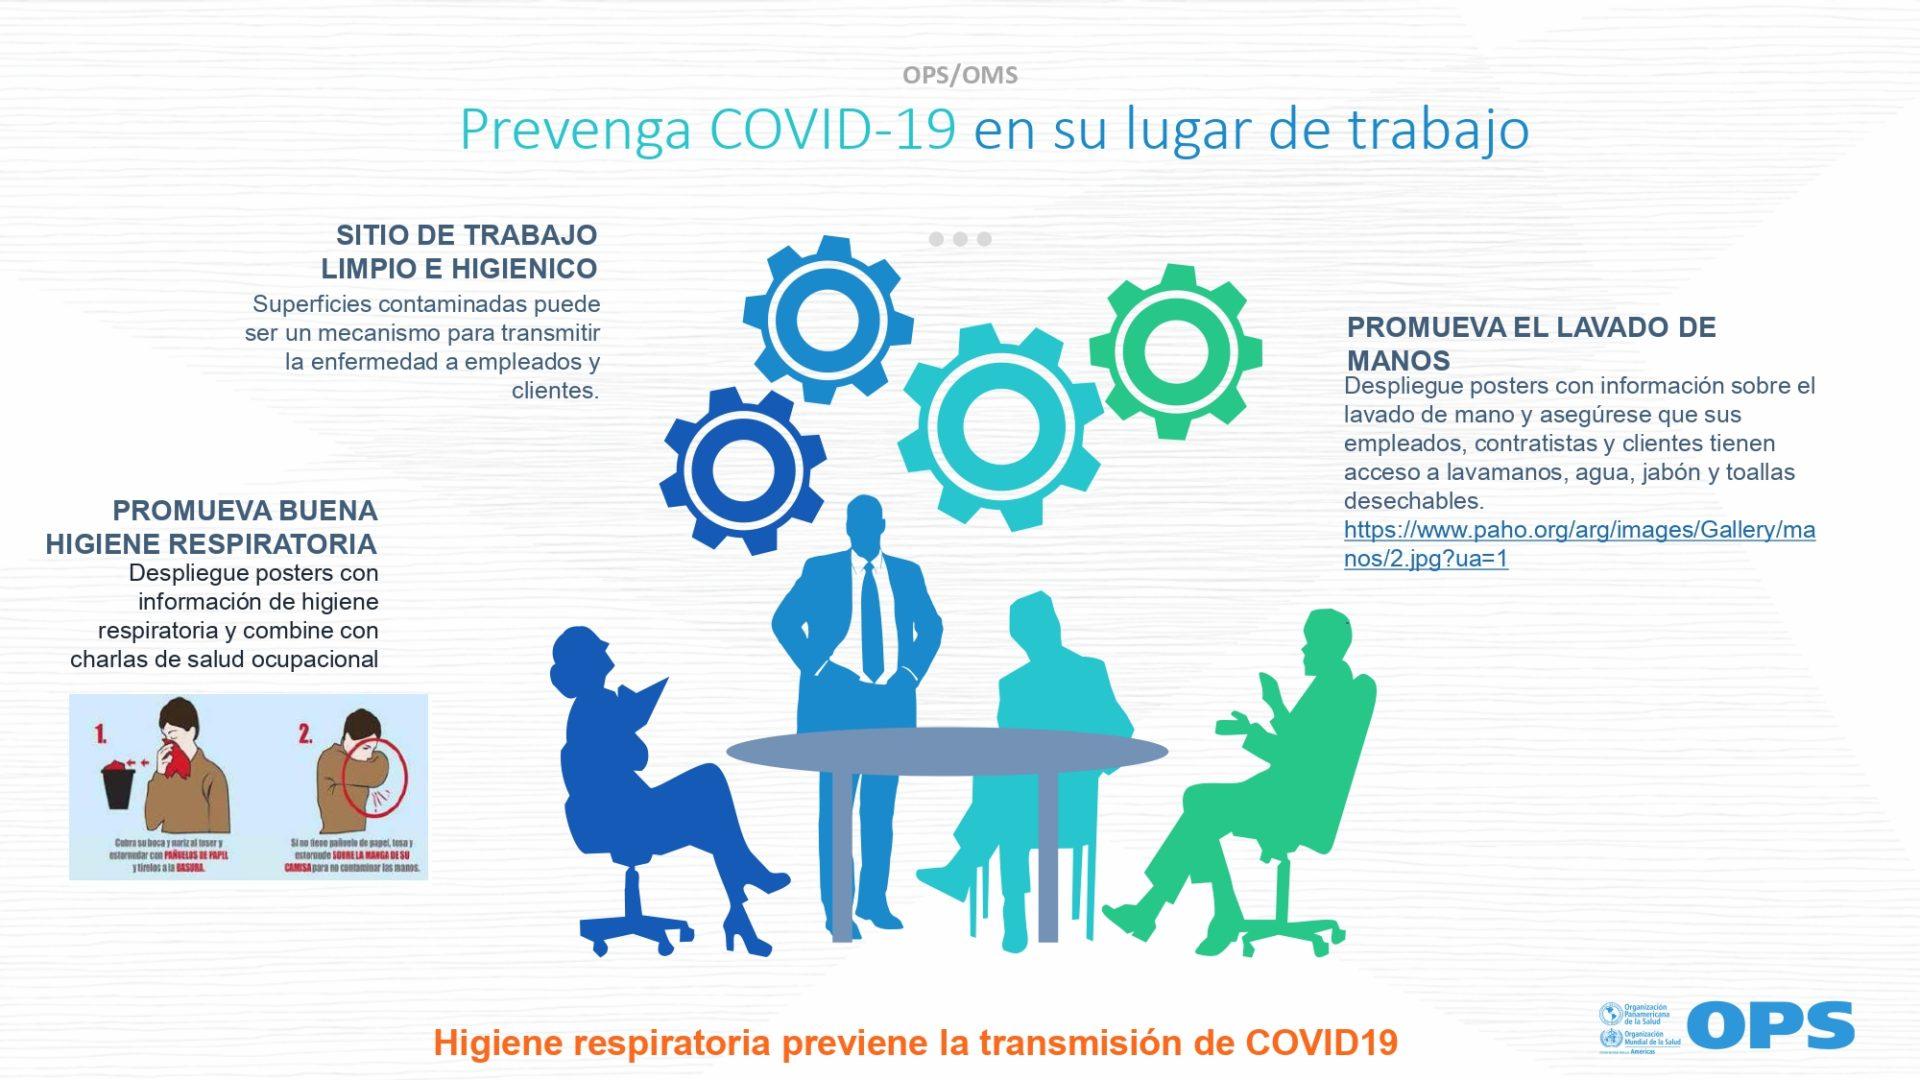 prevencion-covid19-lugar-trabajo_page-0004